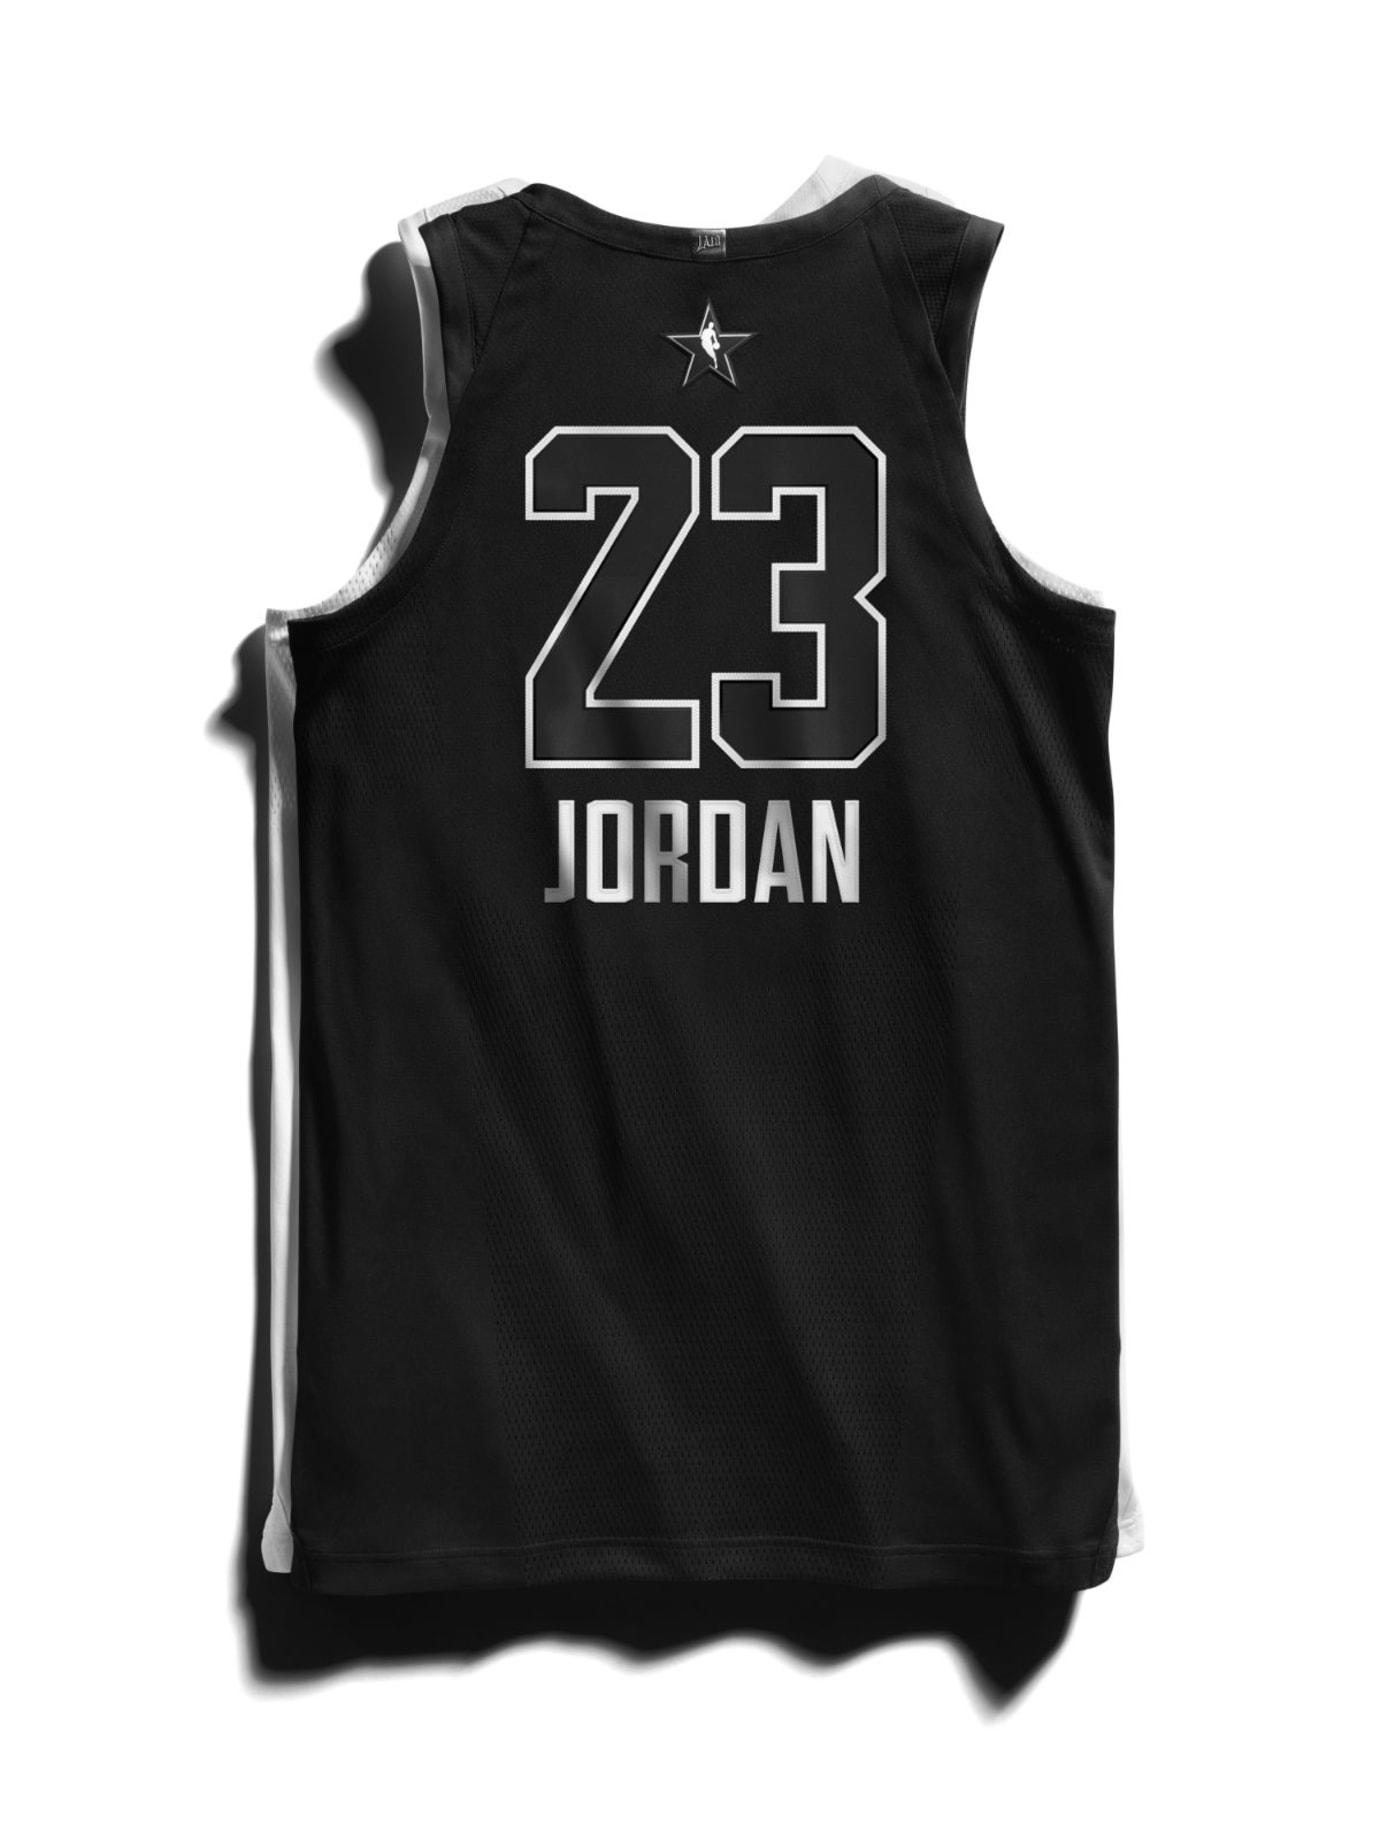 986b0a694b12 Jordan Brand 2018 NBA All-Star Jerseys Back